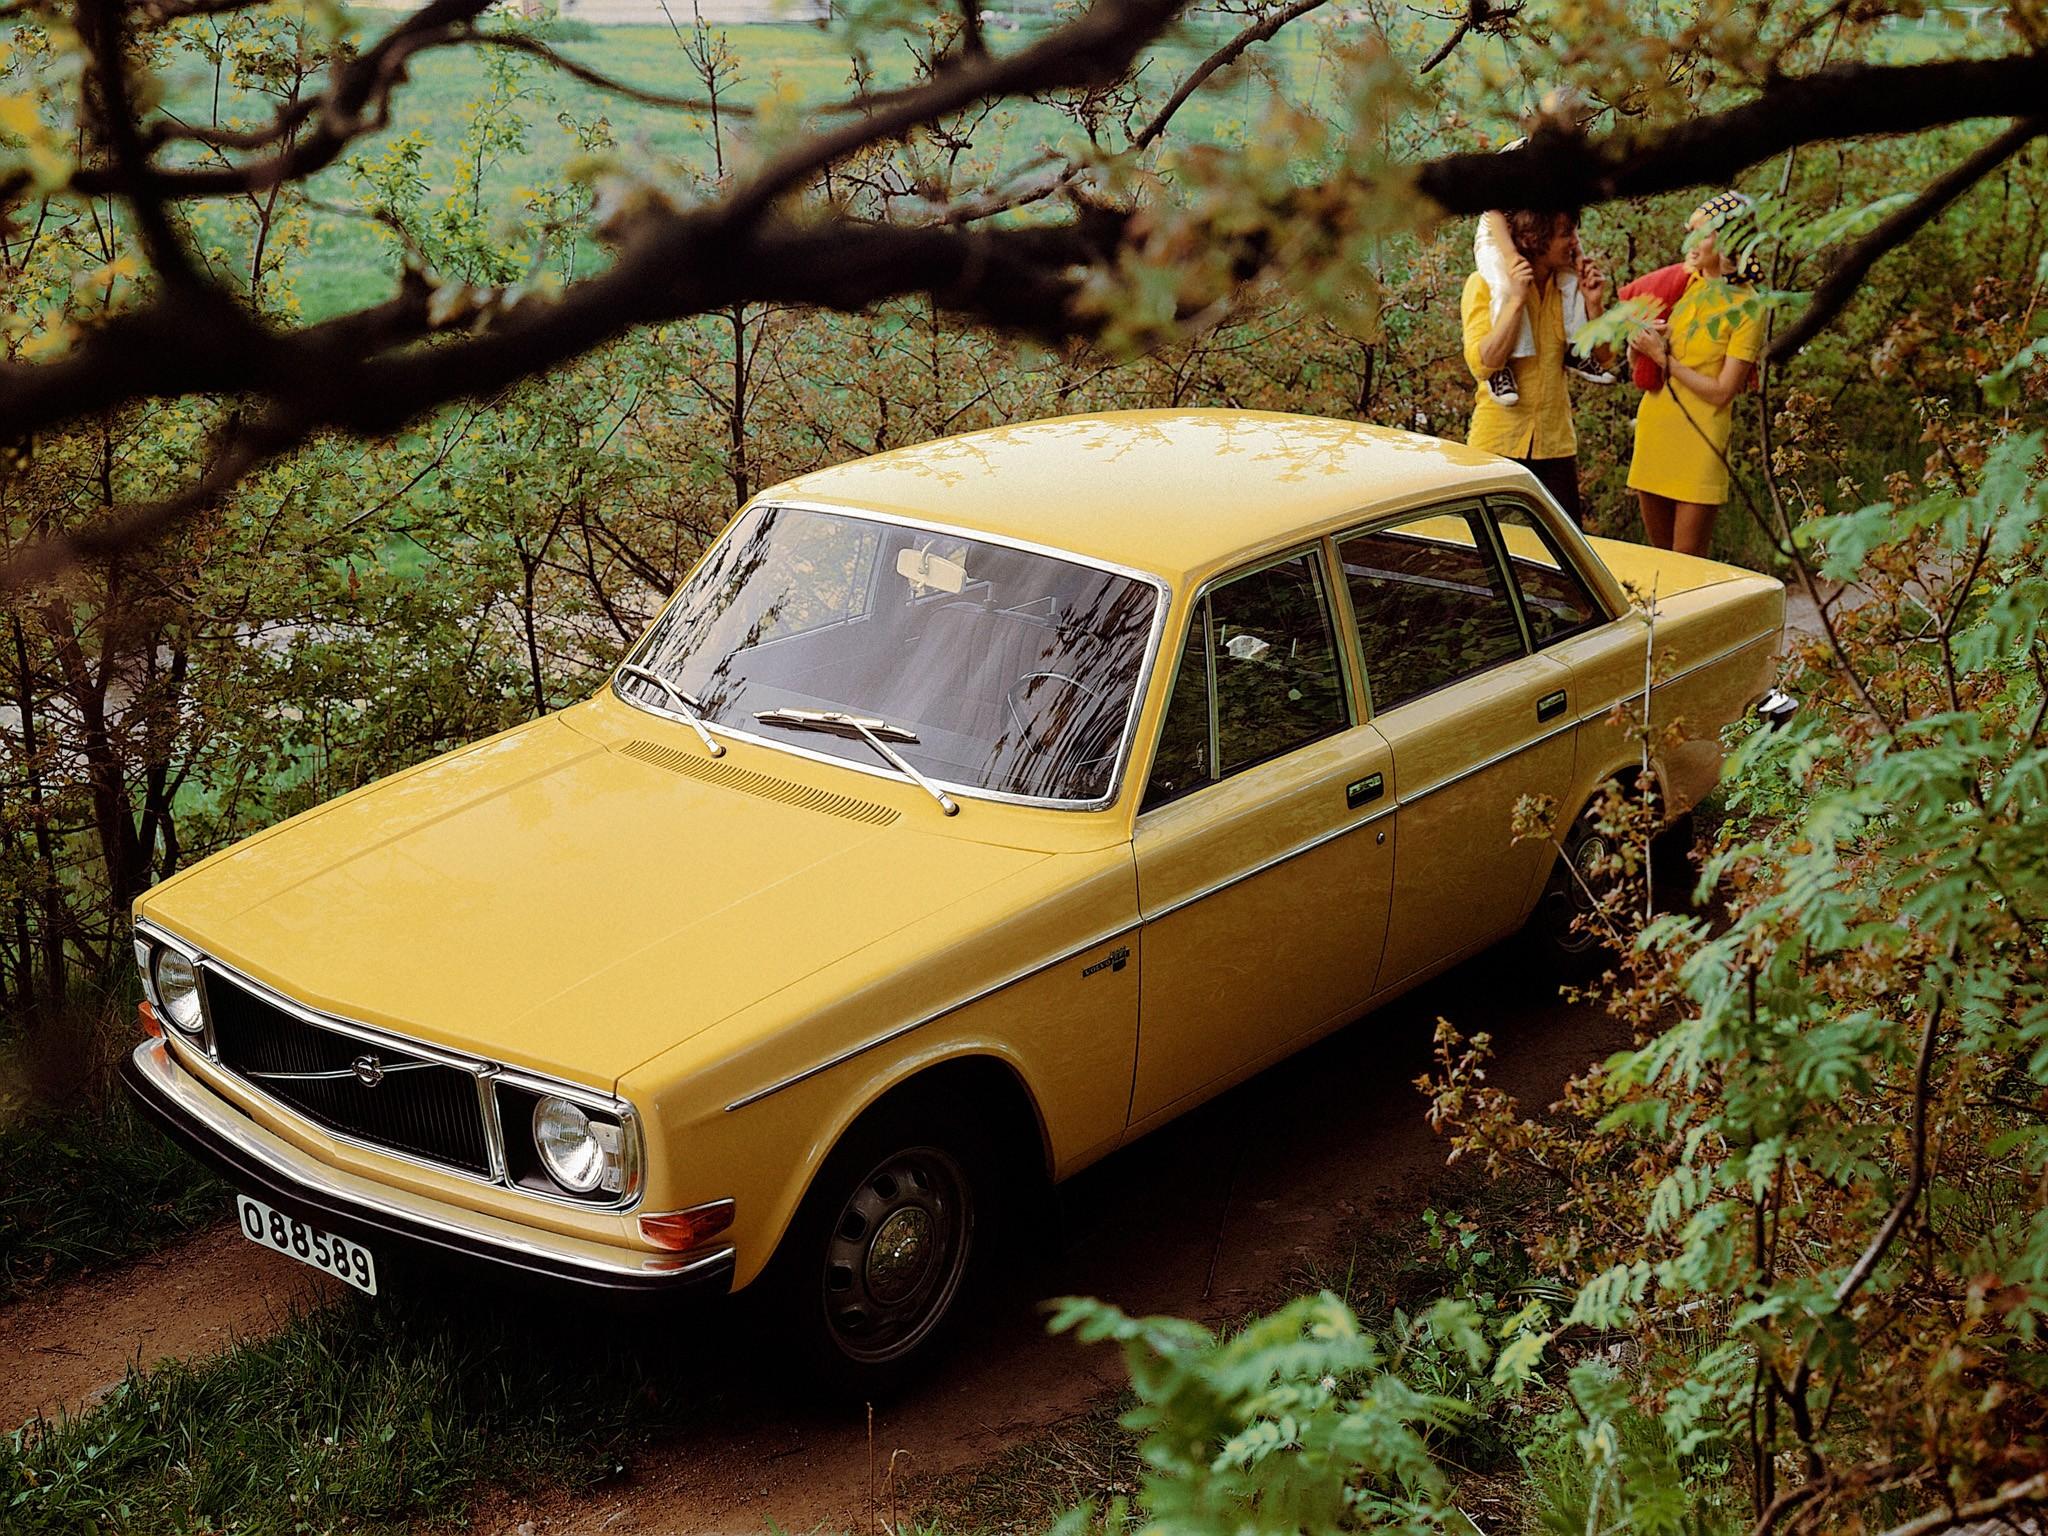 VOLVO 144 - 1967, 1968, 1969, 1970, 1971, 1972, 1973, 1974 - autoevolution